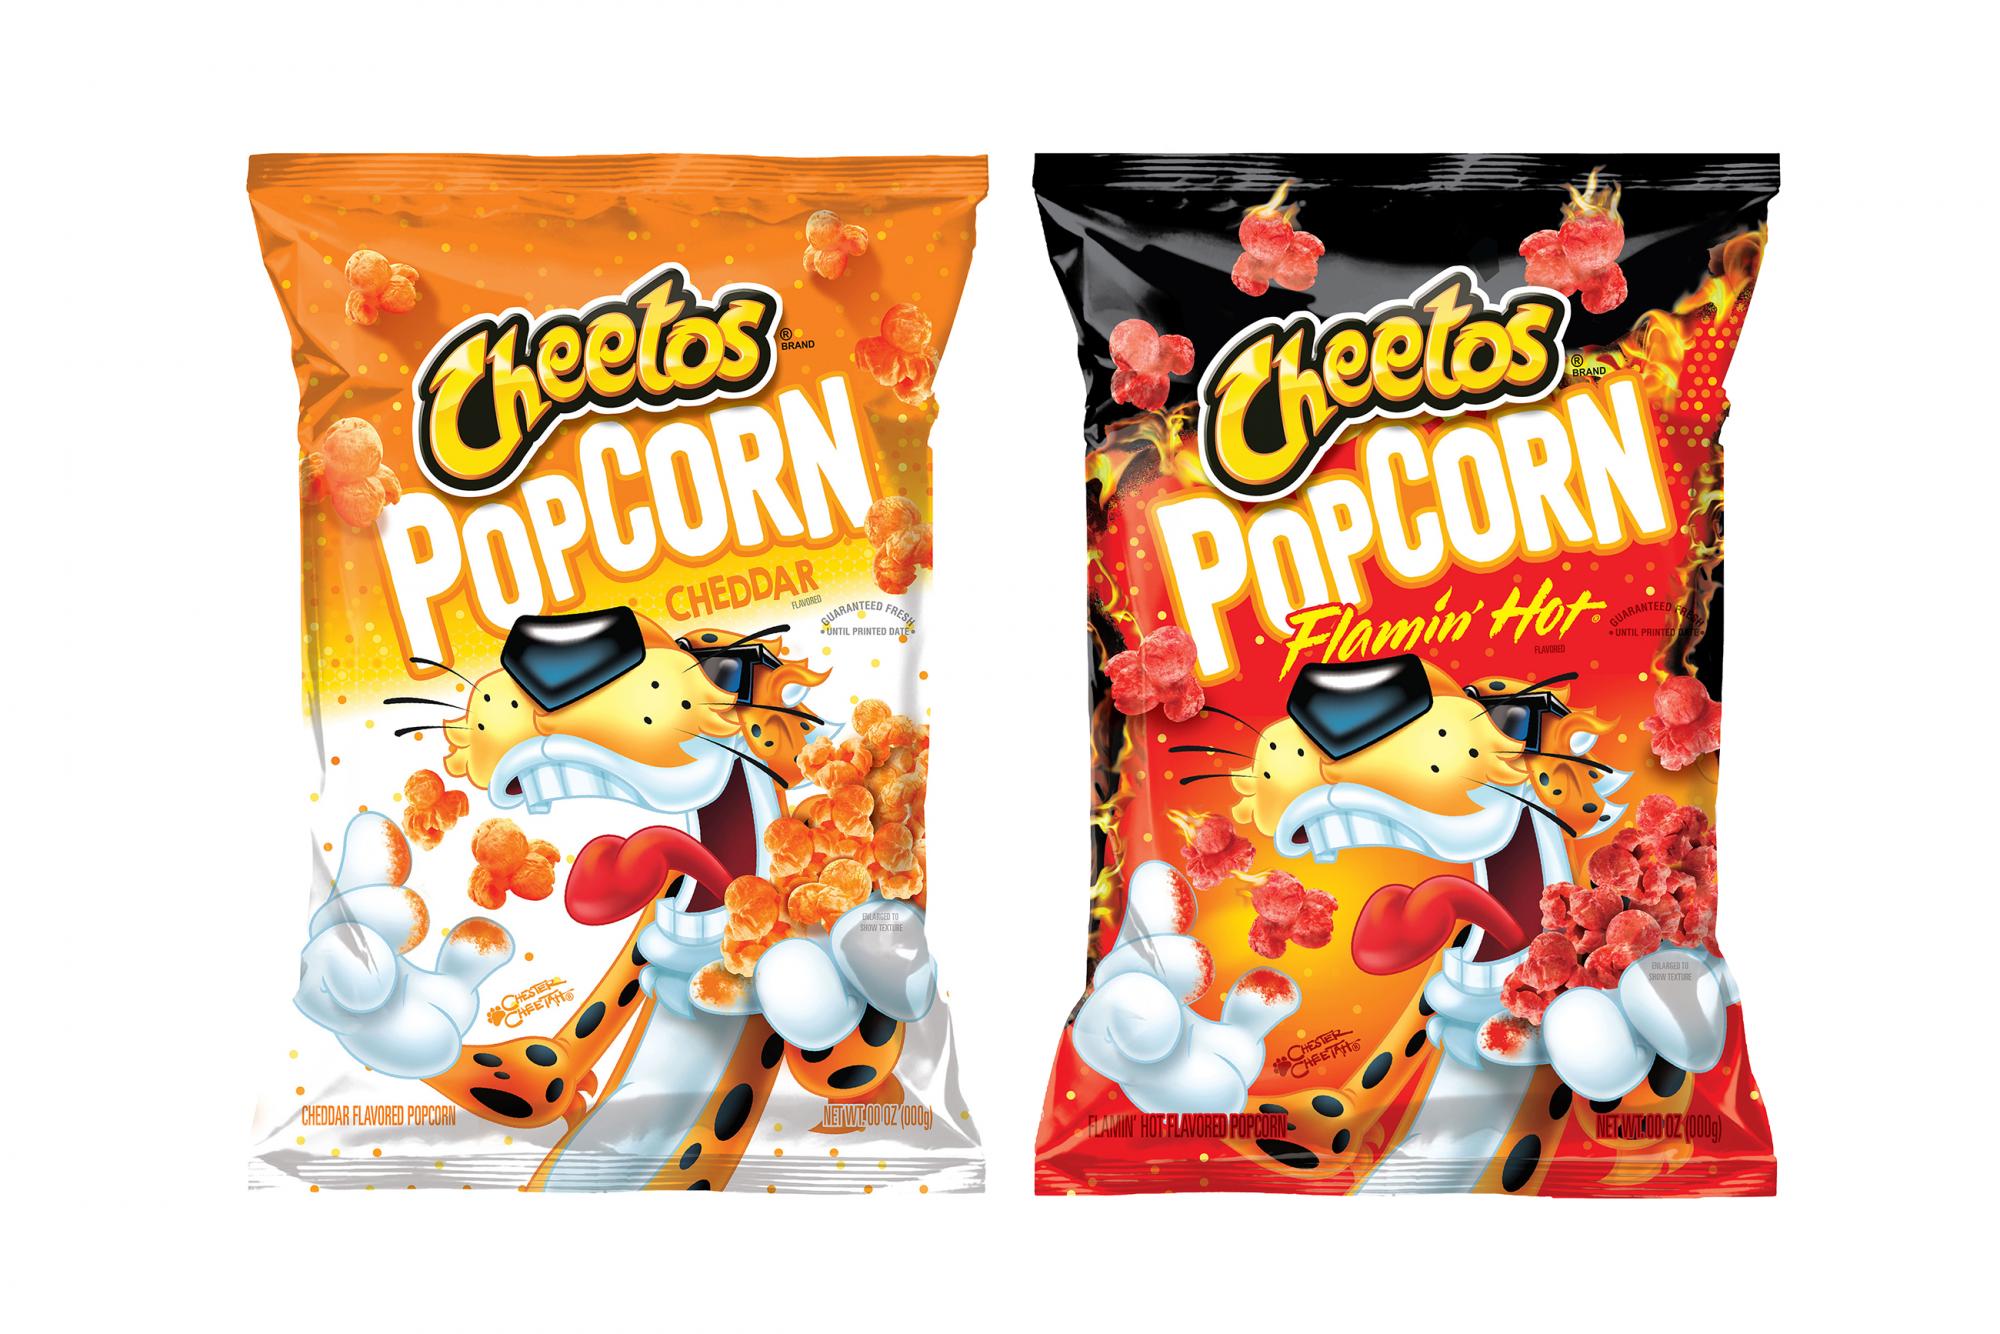 Cheetos cheddar popcorn flamin' hot popcorn